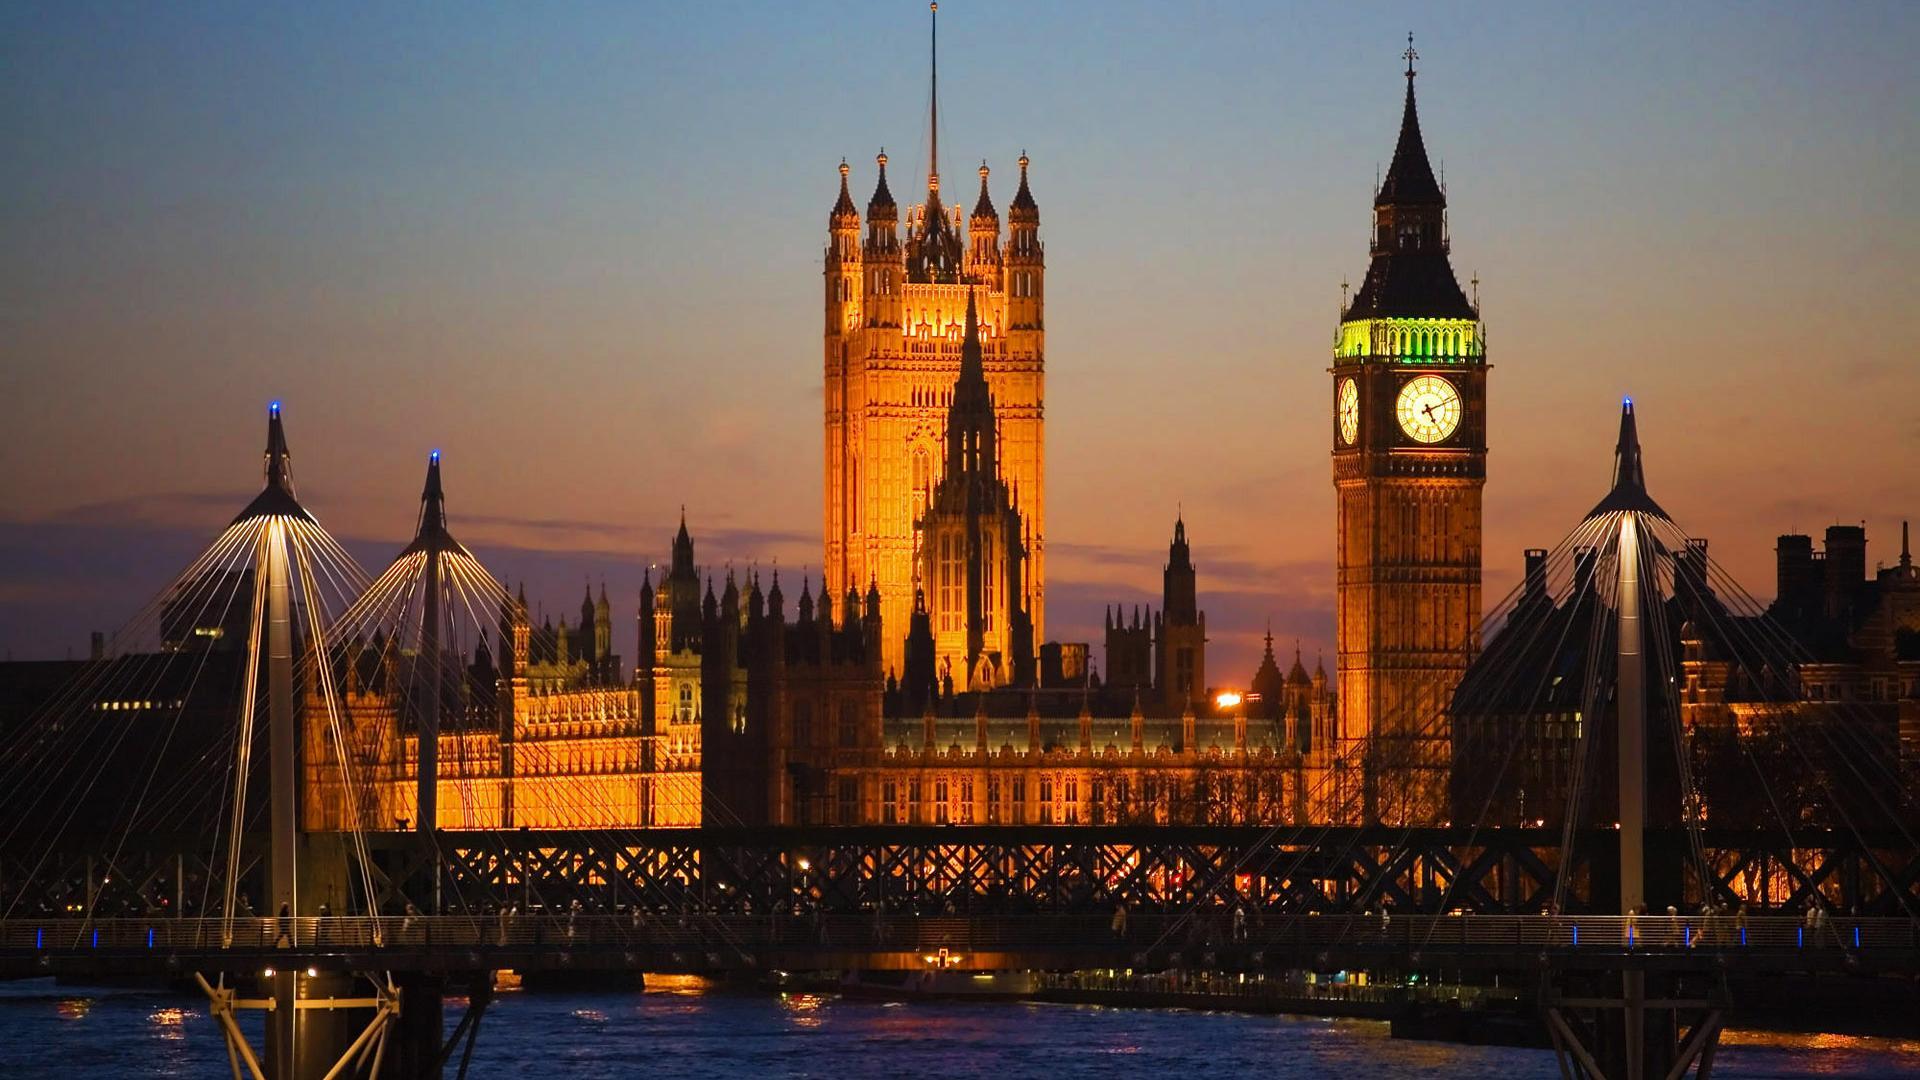 Big Ben, London, England HD 1920x1080